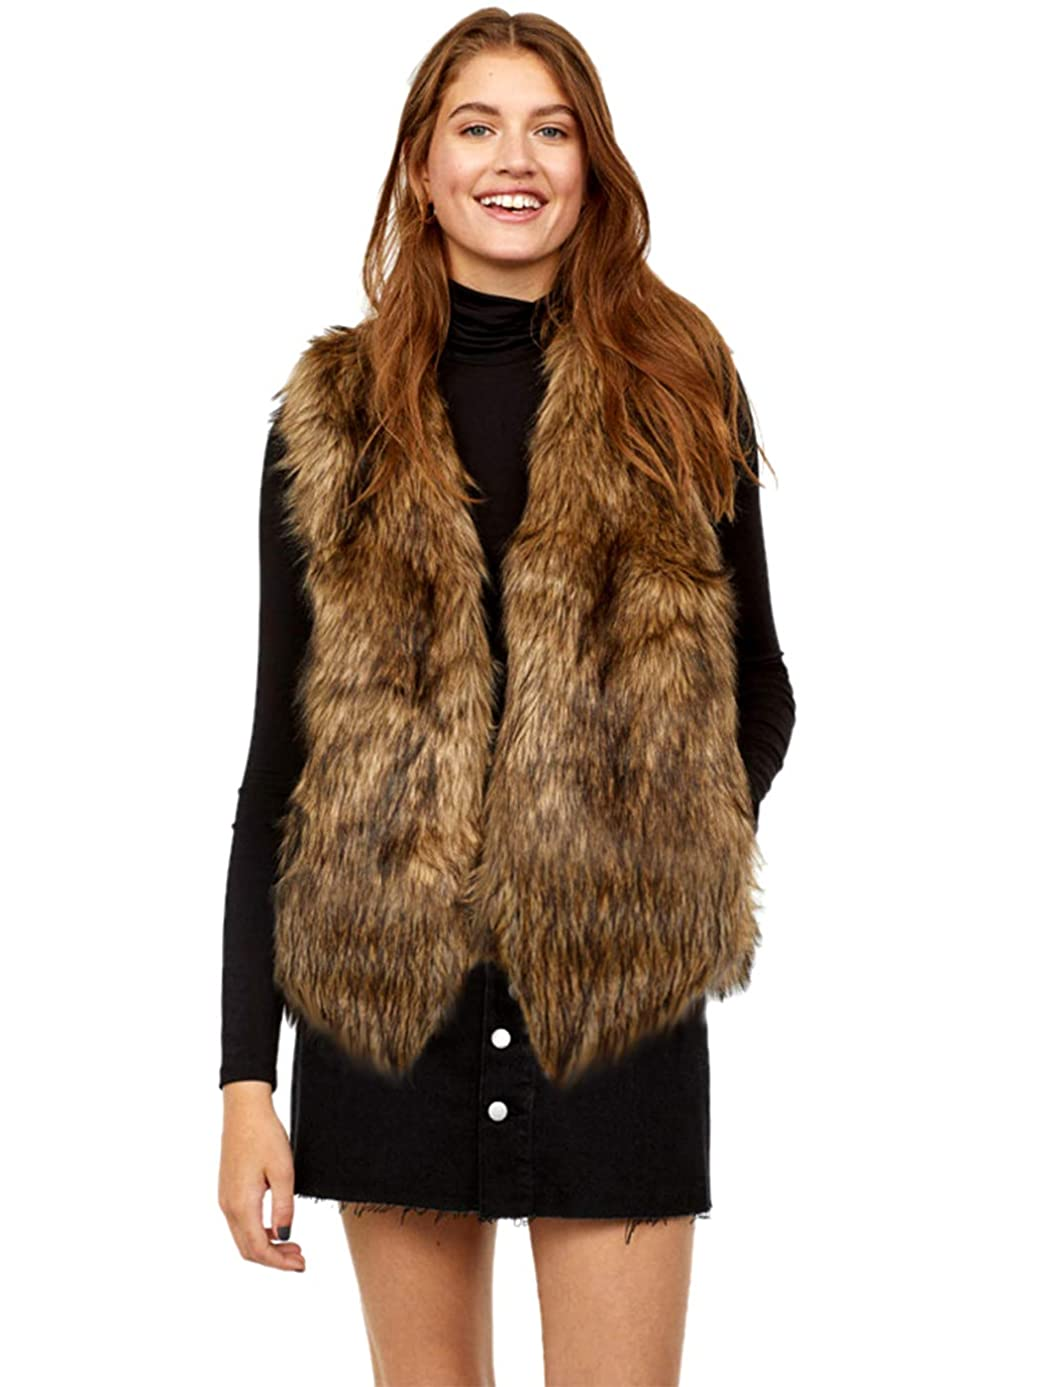 Edary Women Faux Fur Vest Brown Vintage Warm Waistcoat Sleeveless Jacket